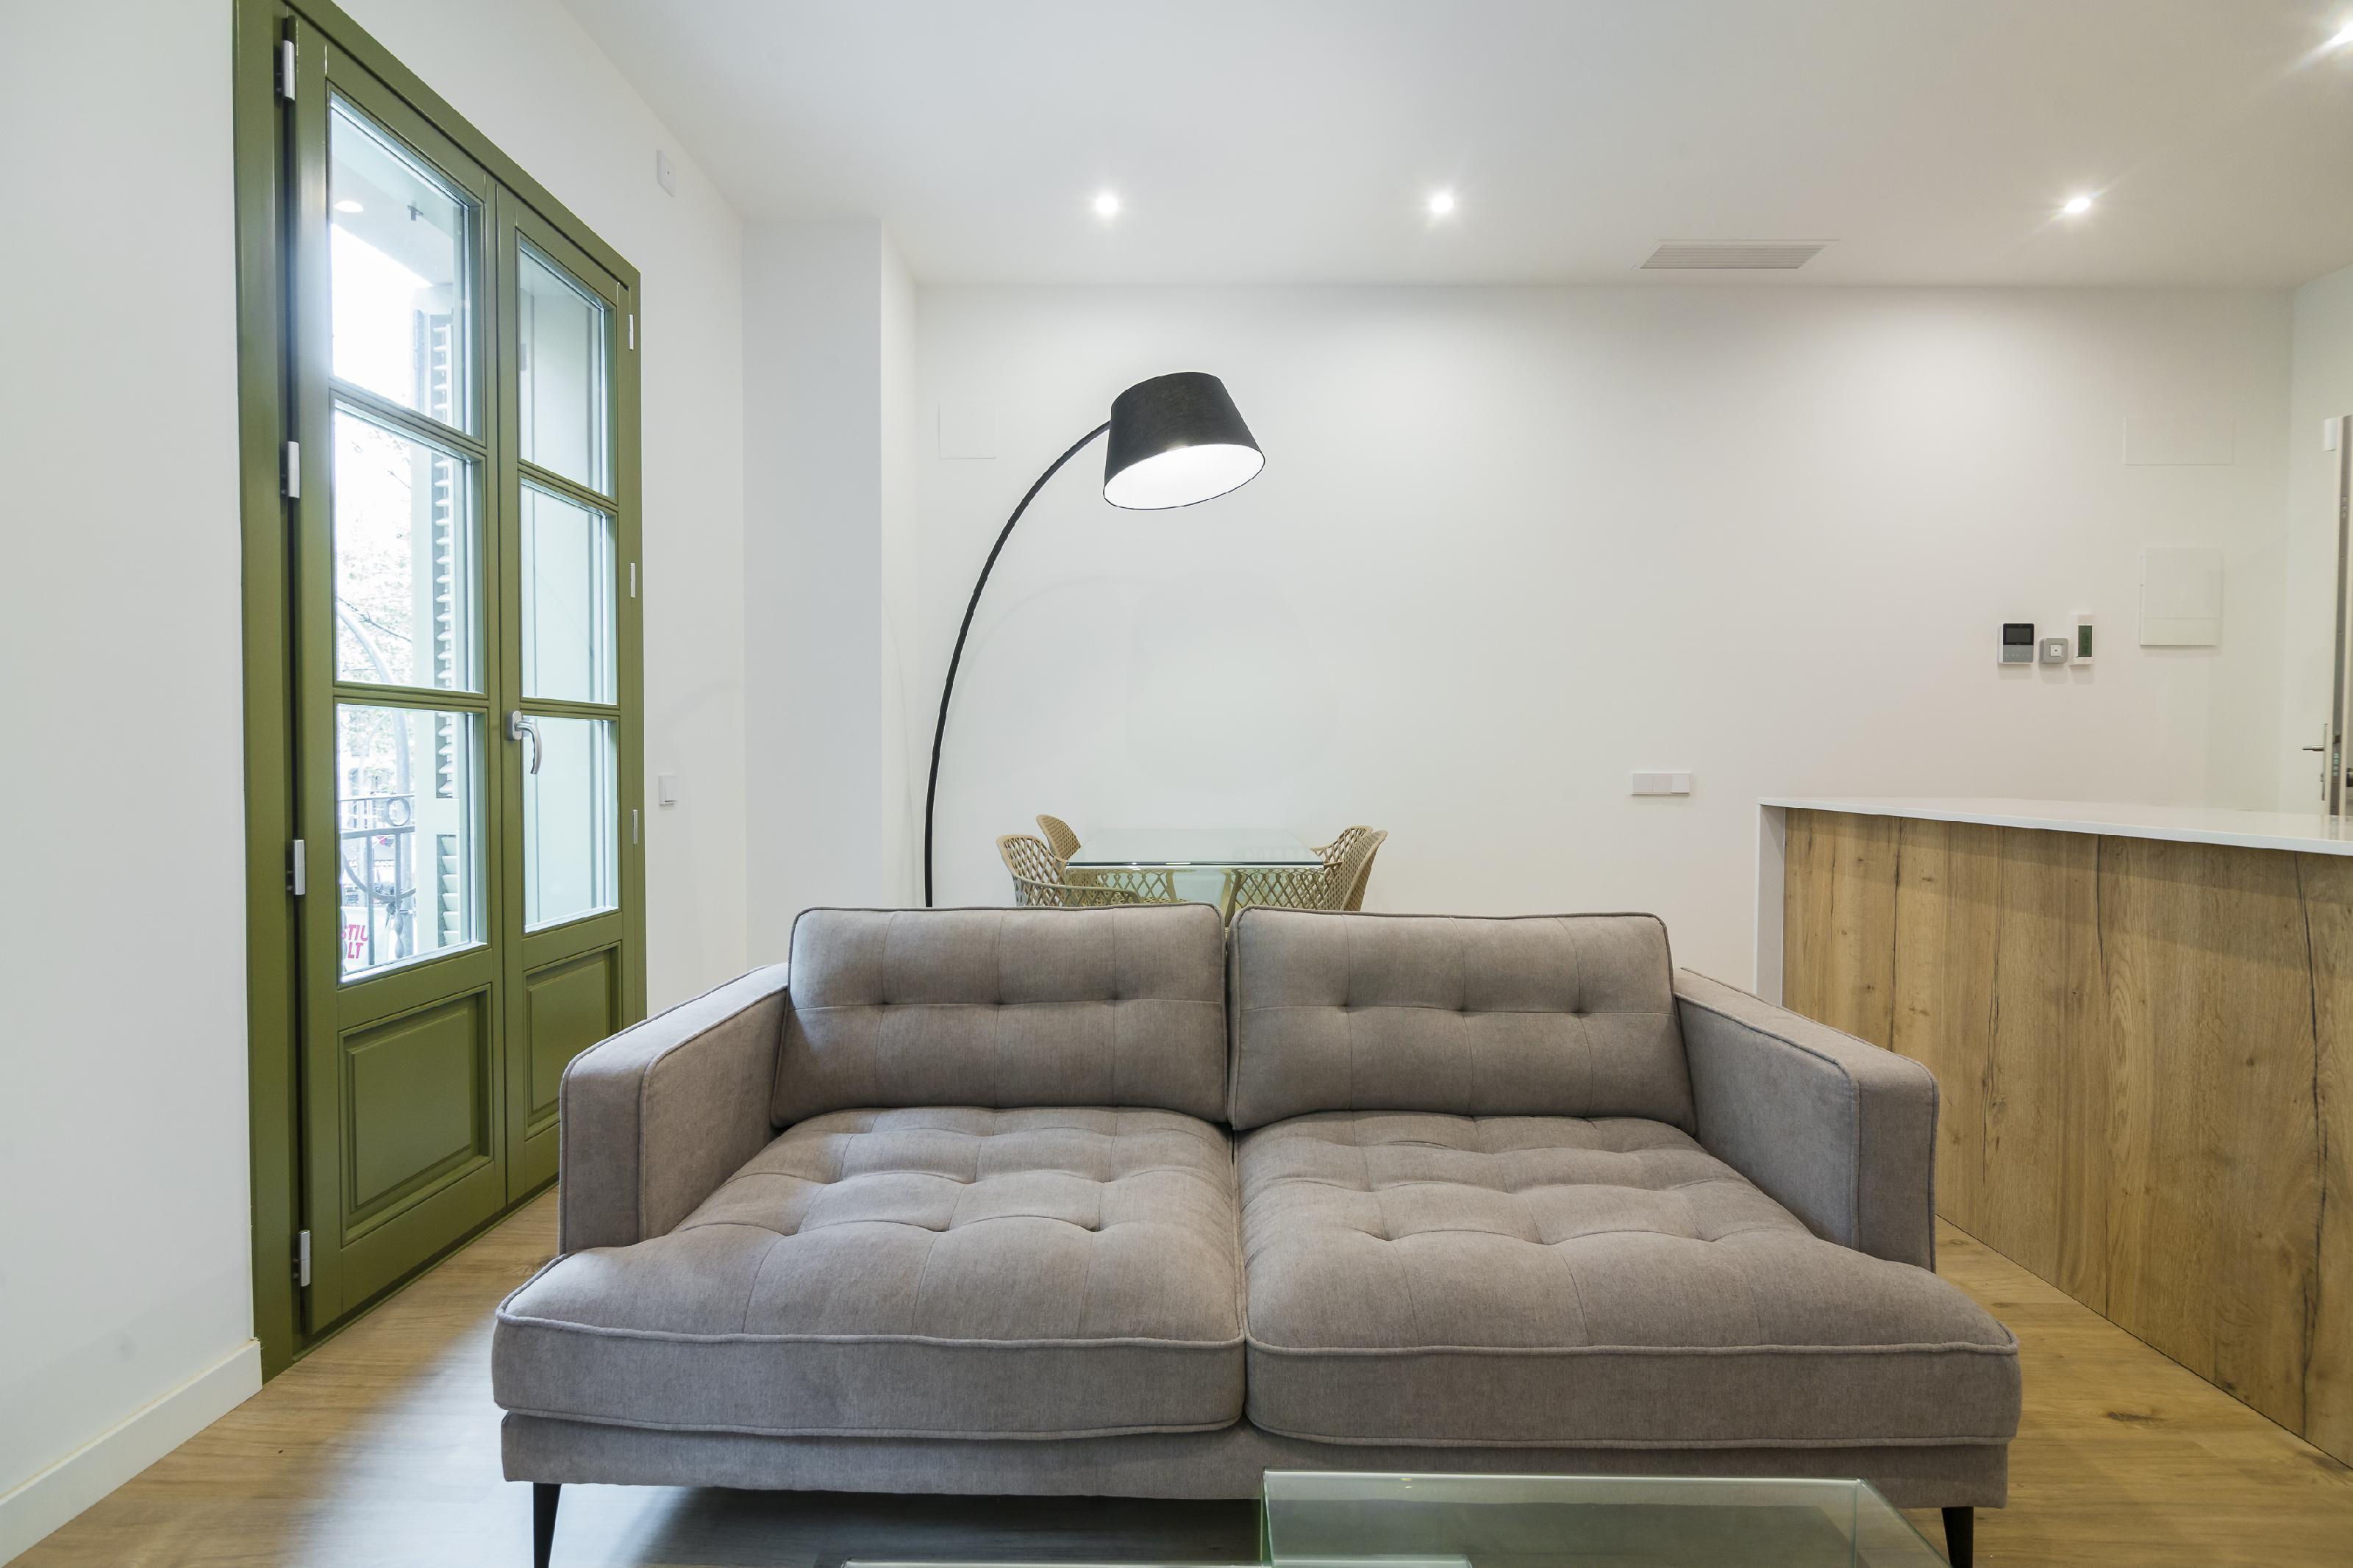 249266 Flat for sale in Eixample, Nova Esquerra Eixample 16